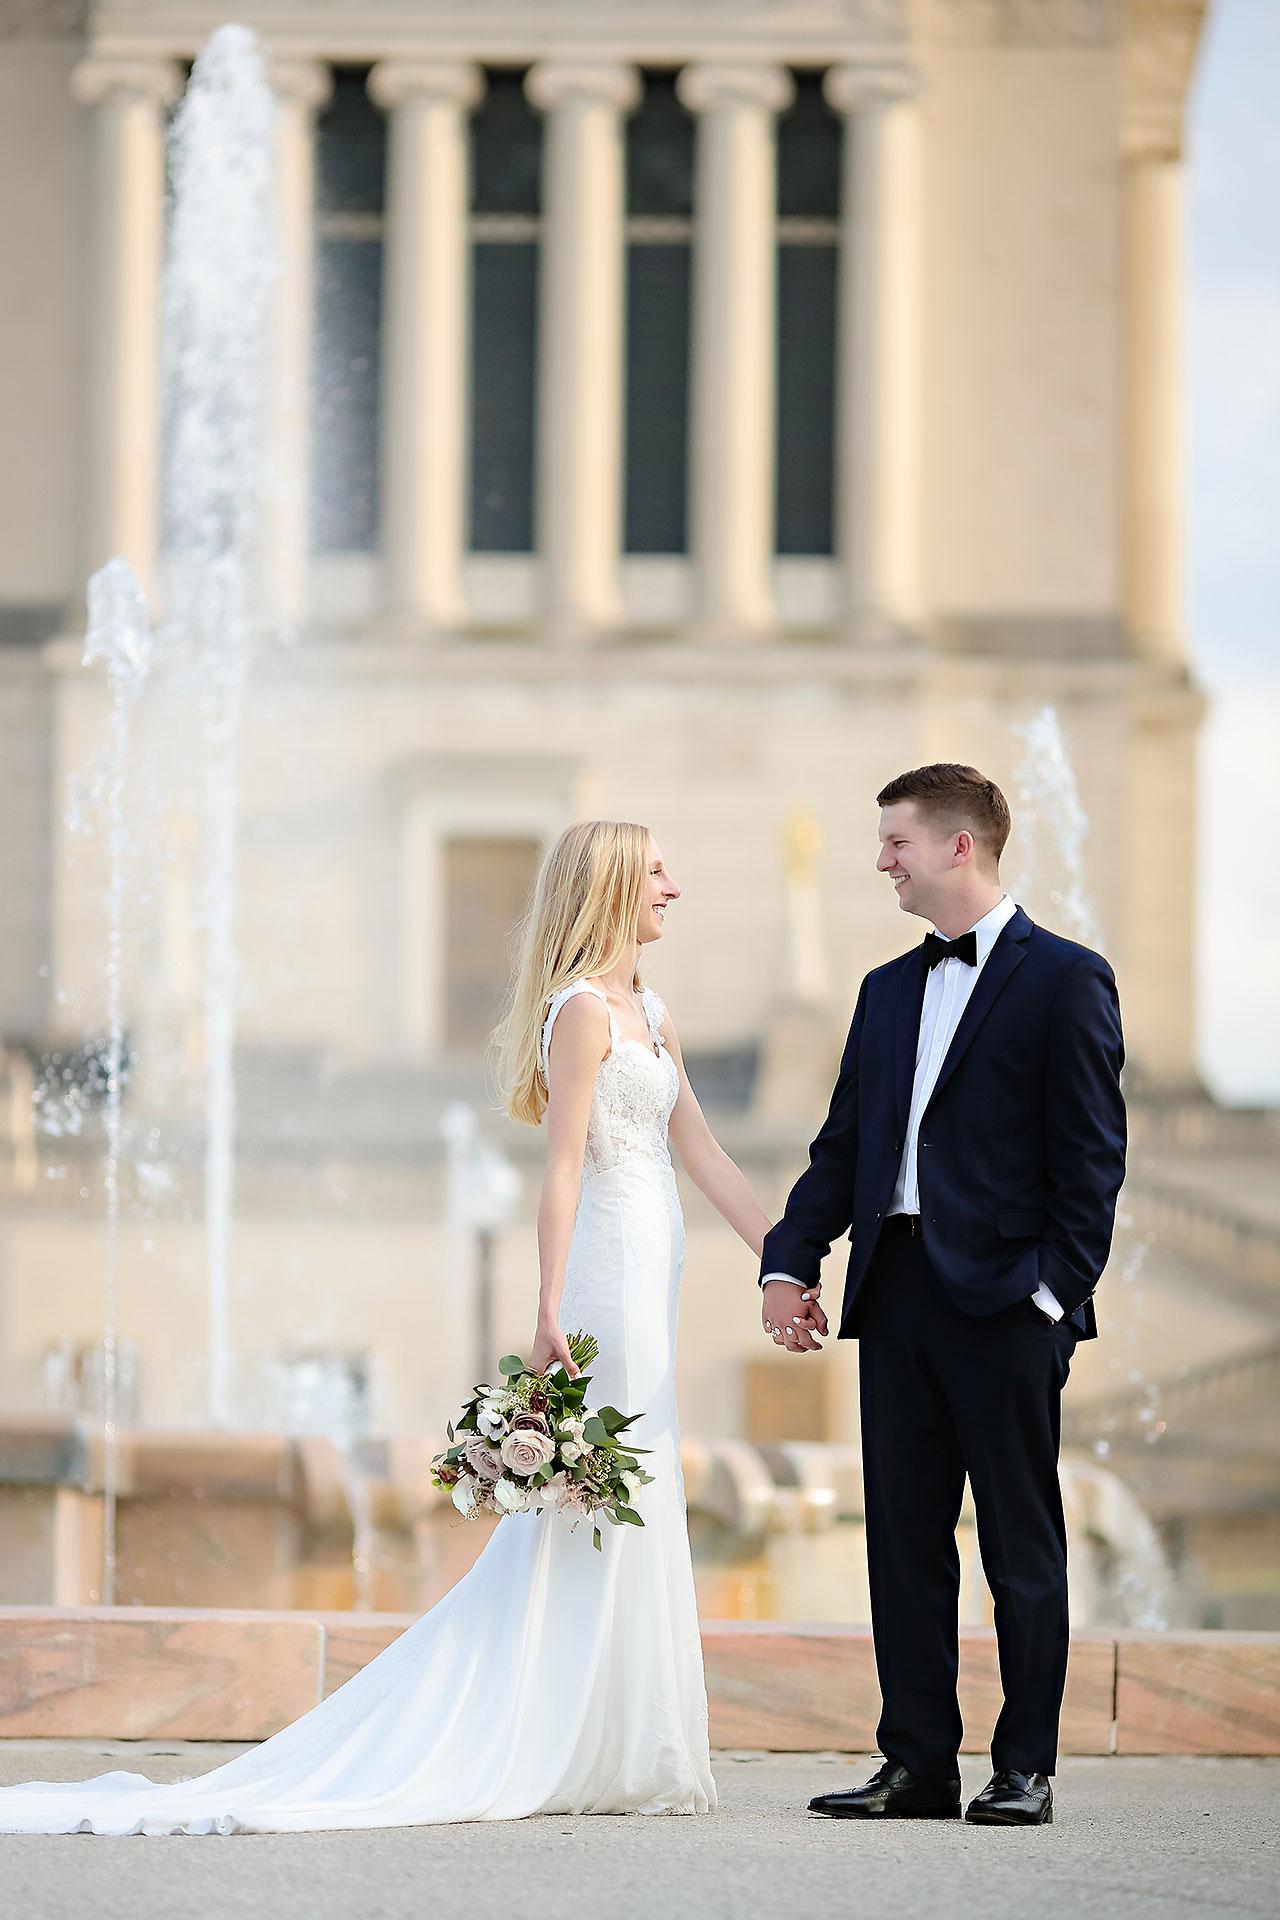 Molly Declan Scottish Rite Indianapolis Wedding 234